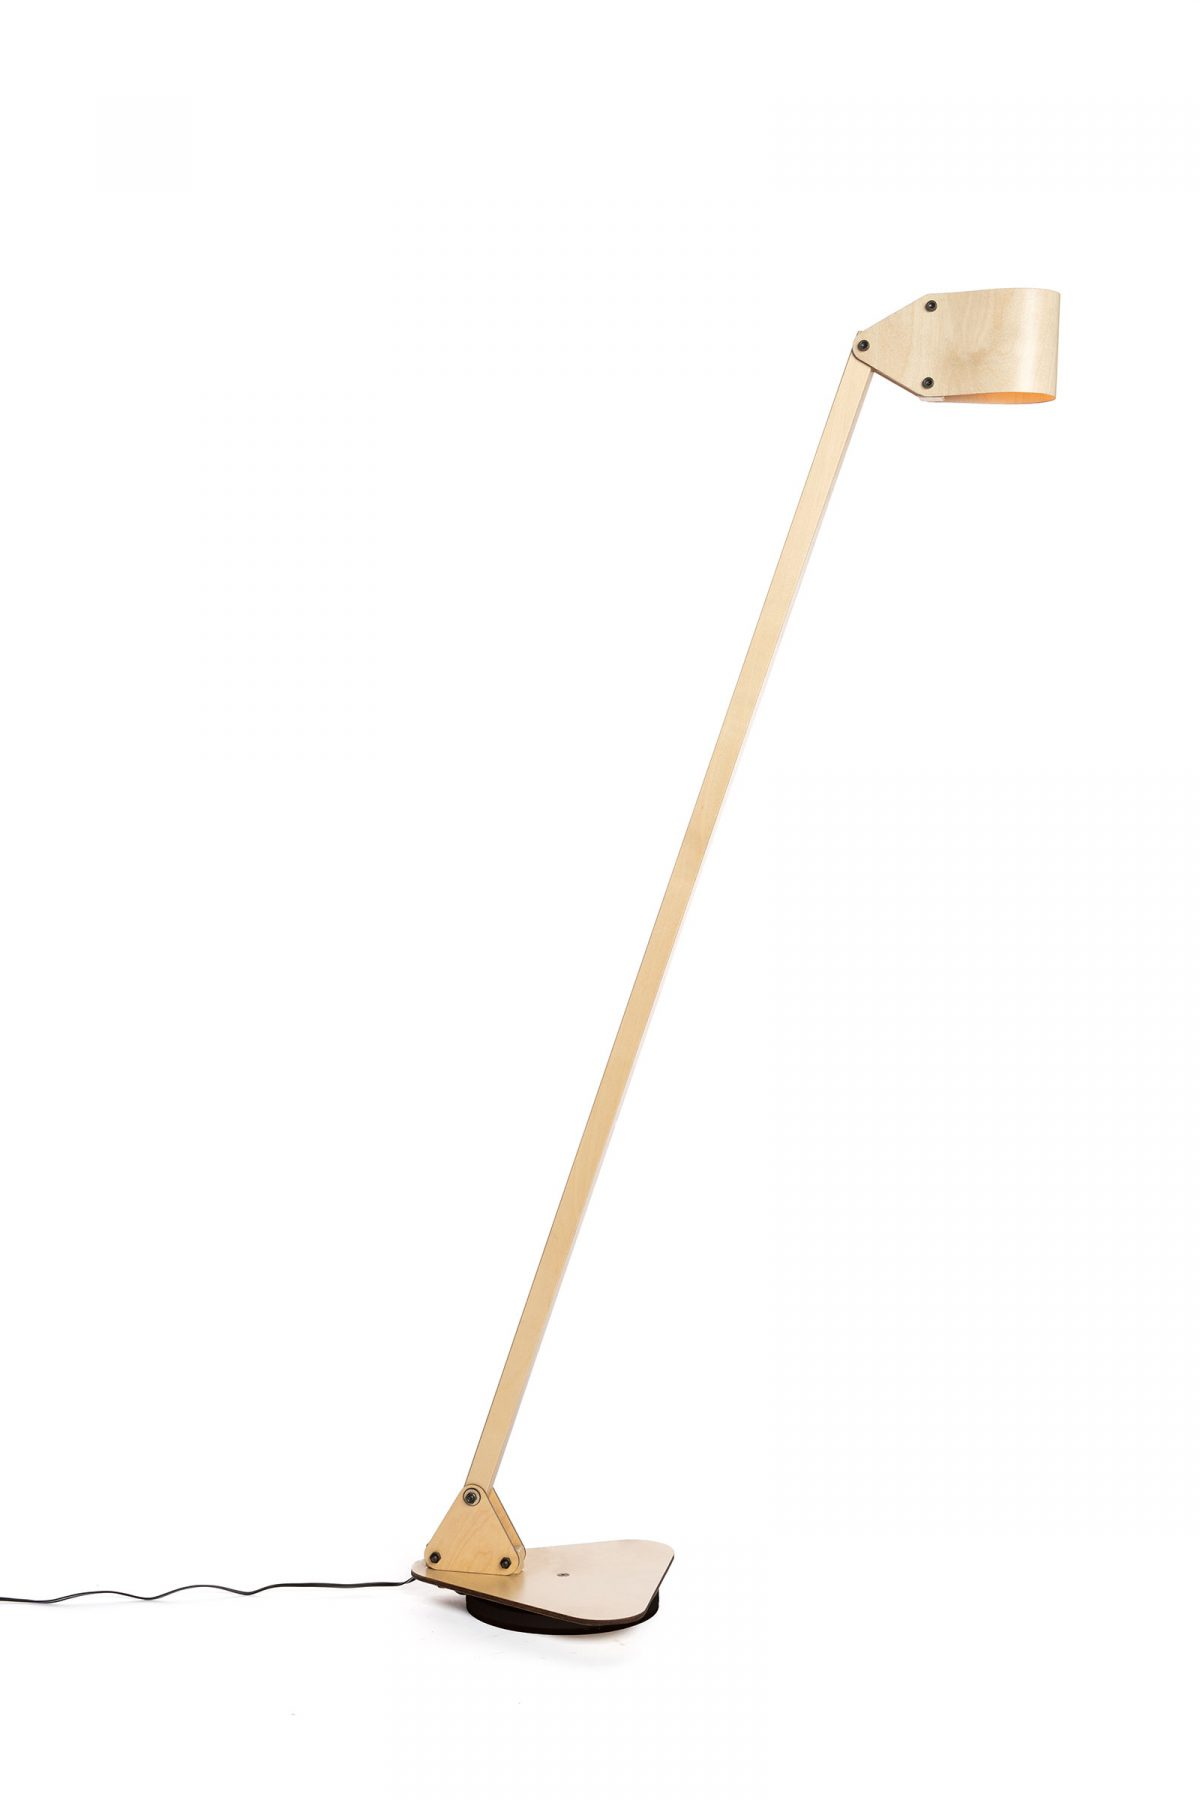 24mm Triangle floor lamp